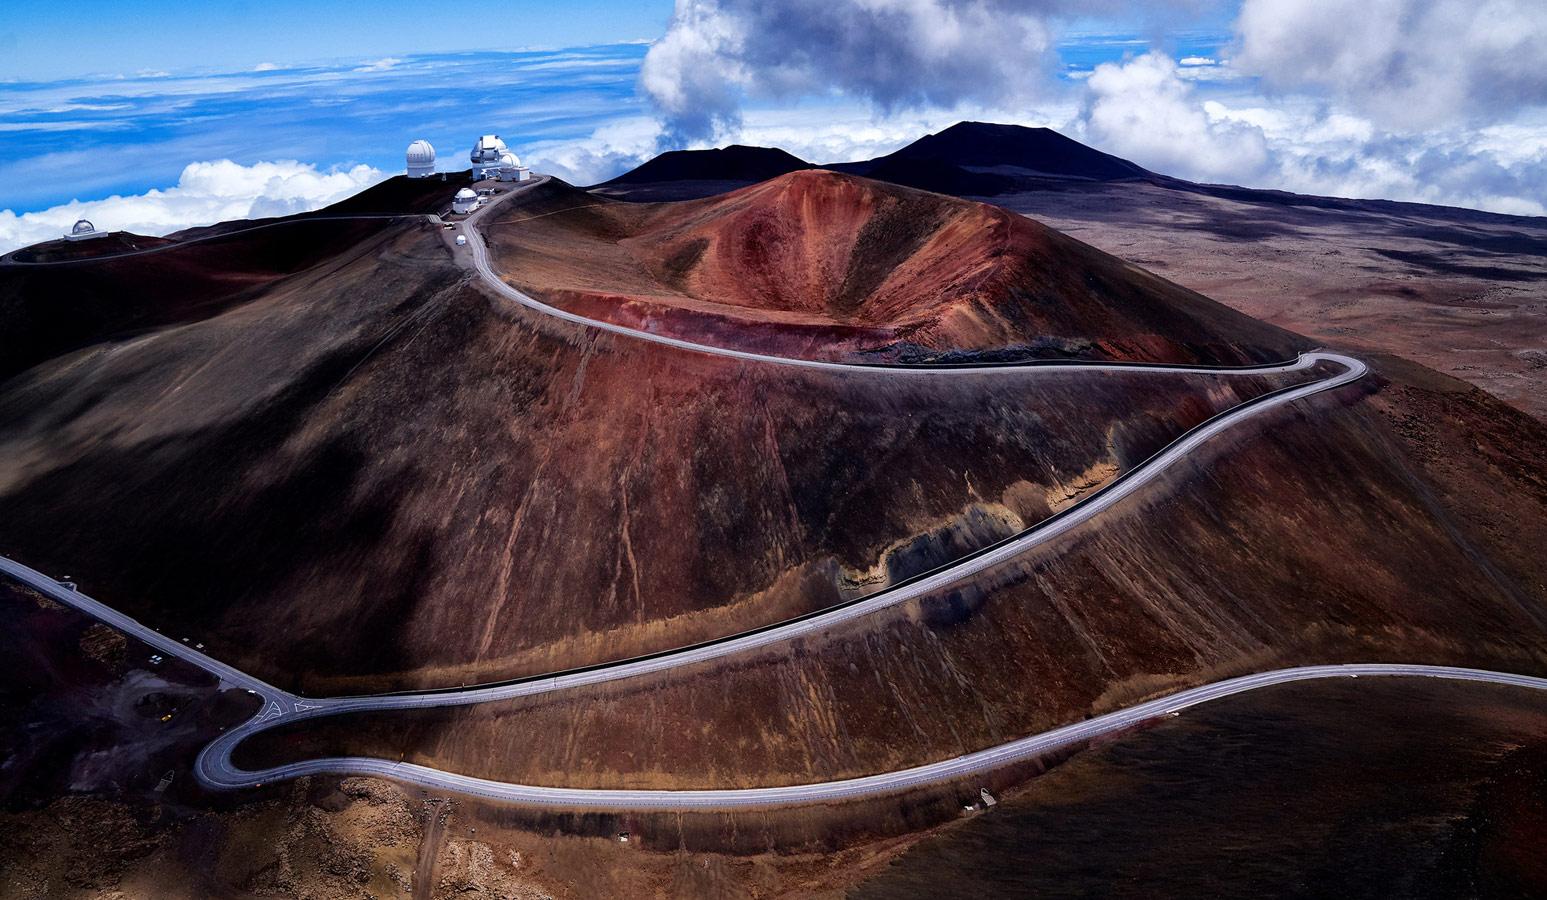 Мауна-Кеа, © Стюарт Чапе, Апиа, Самоа, Финалист категории «Кадры путешествий», профессионал, Фотоконкурс экстремальных путешествий «Мир в фокусе» — World In Focus